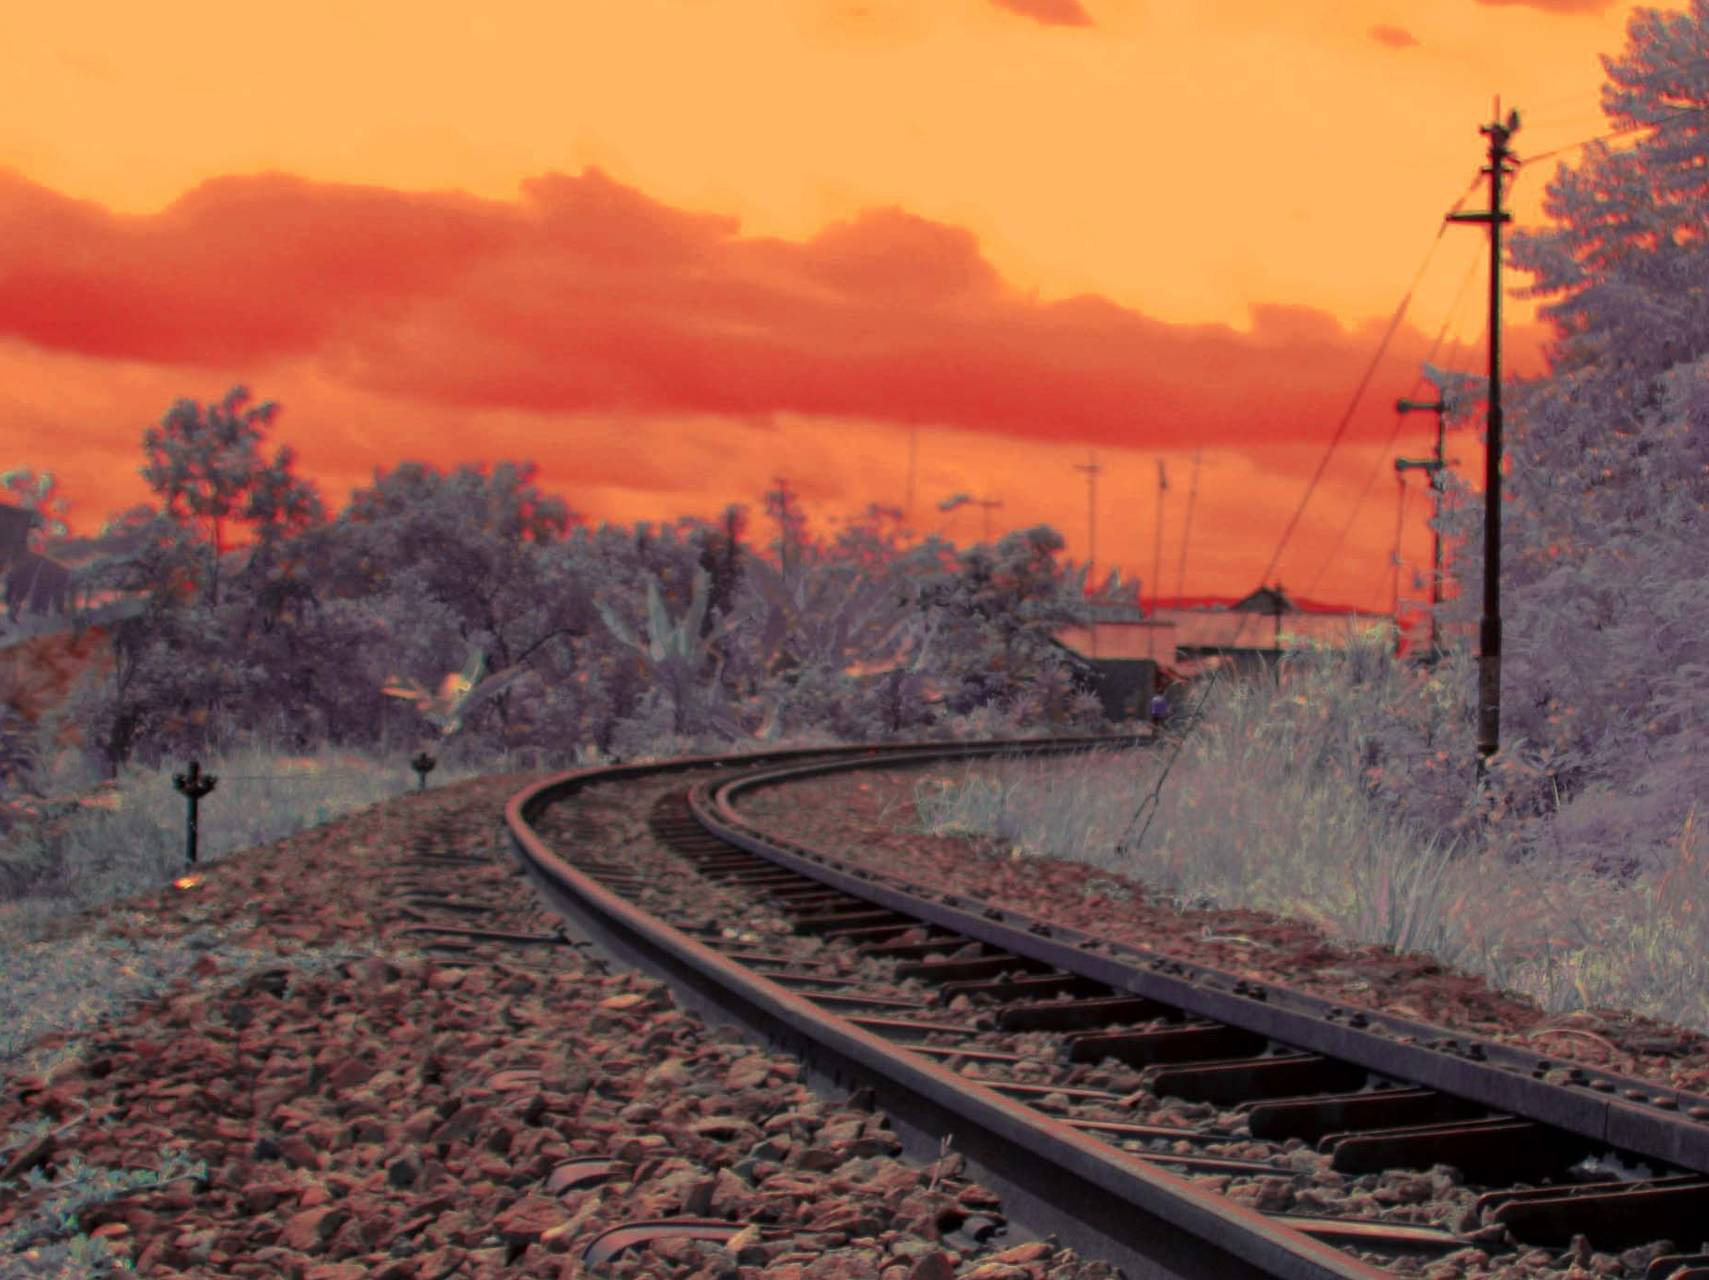 Ir Railway